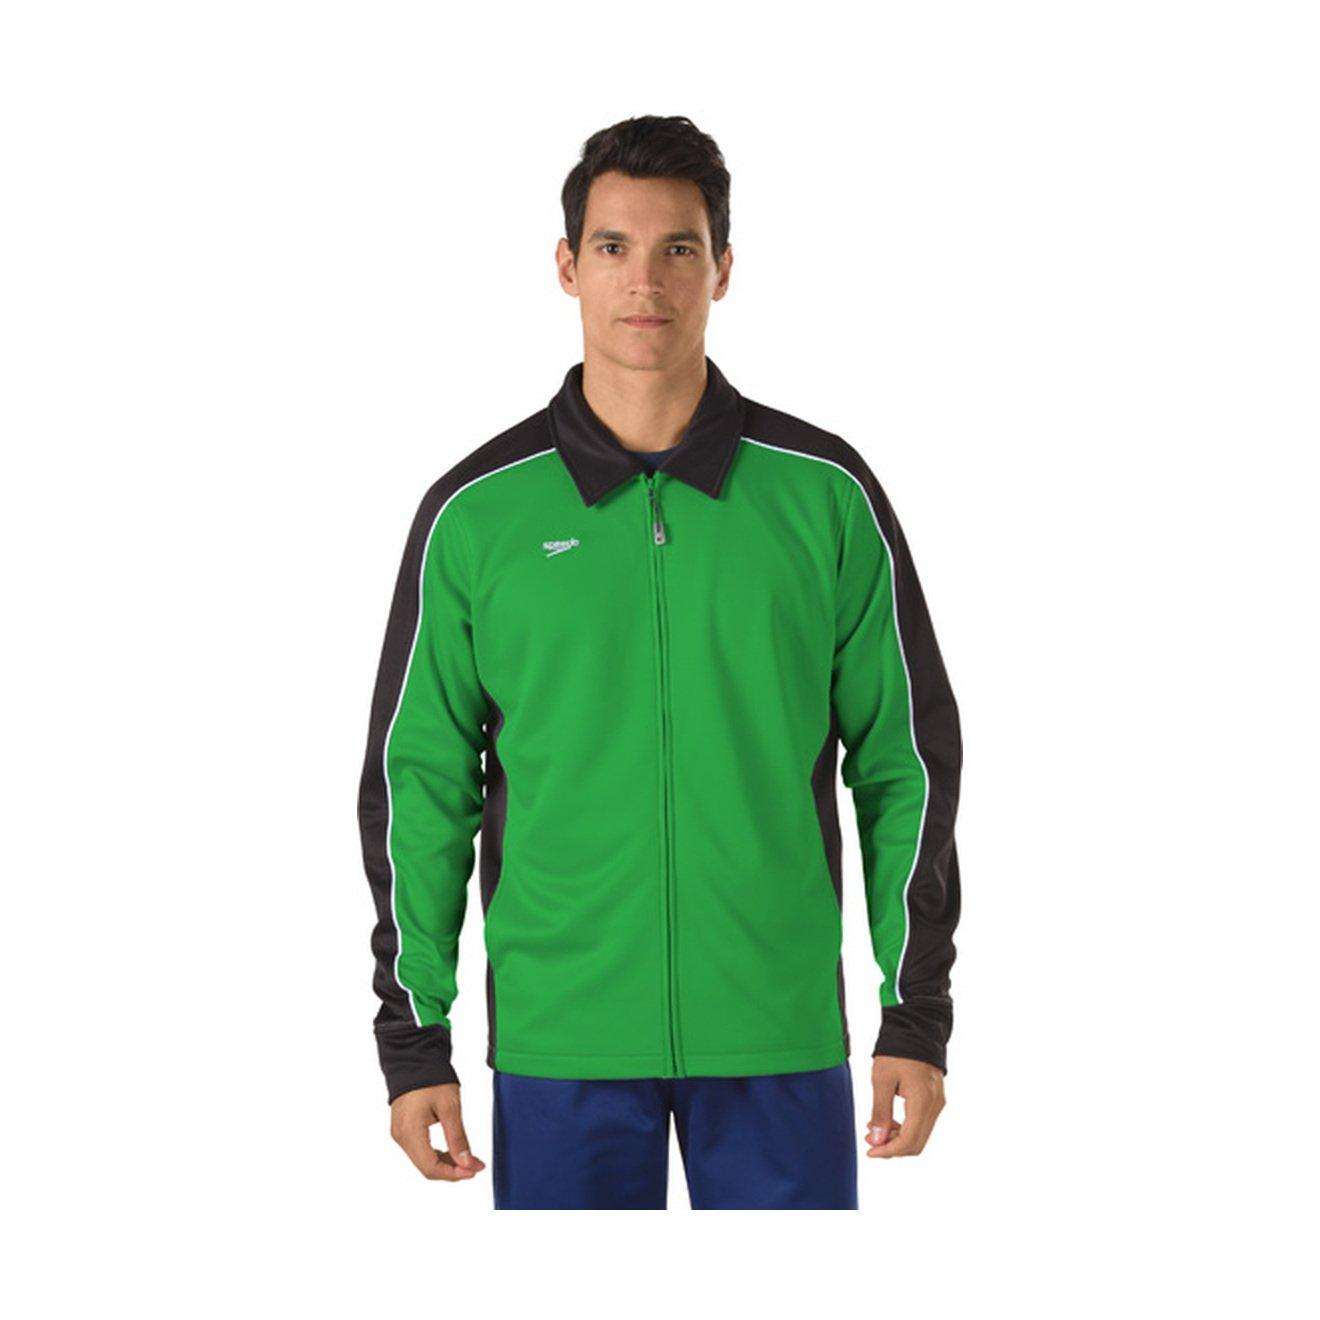 Speedo Men's Streamline Warm Up Jacket 7201472